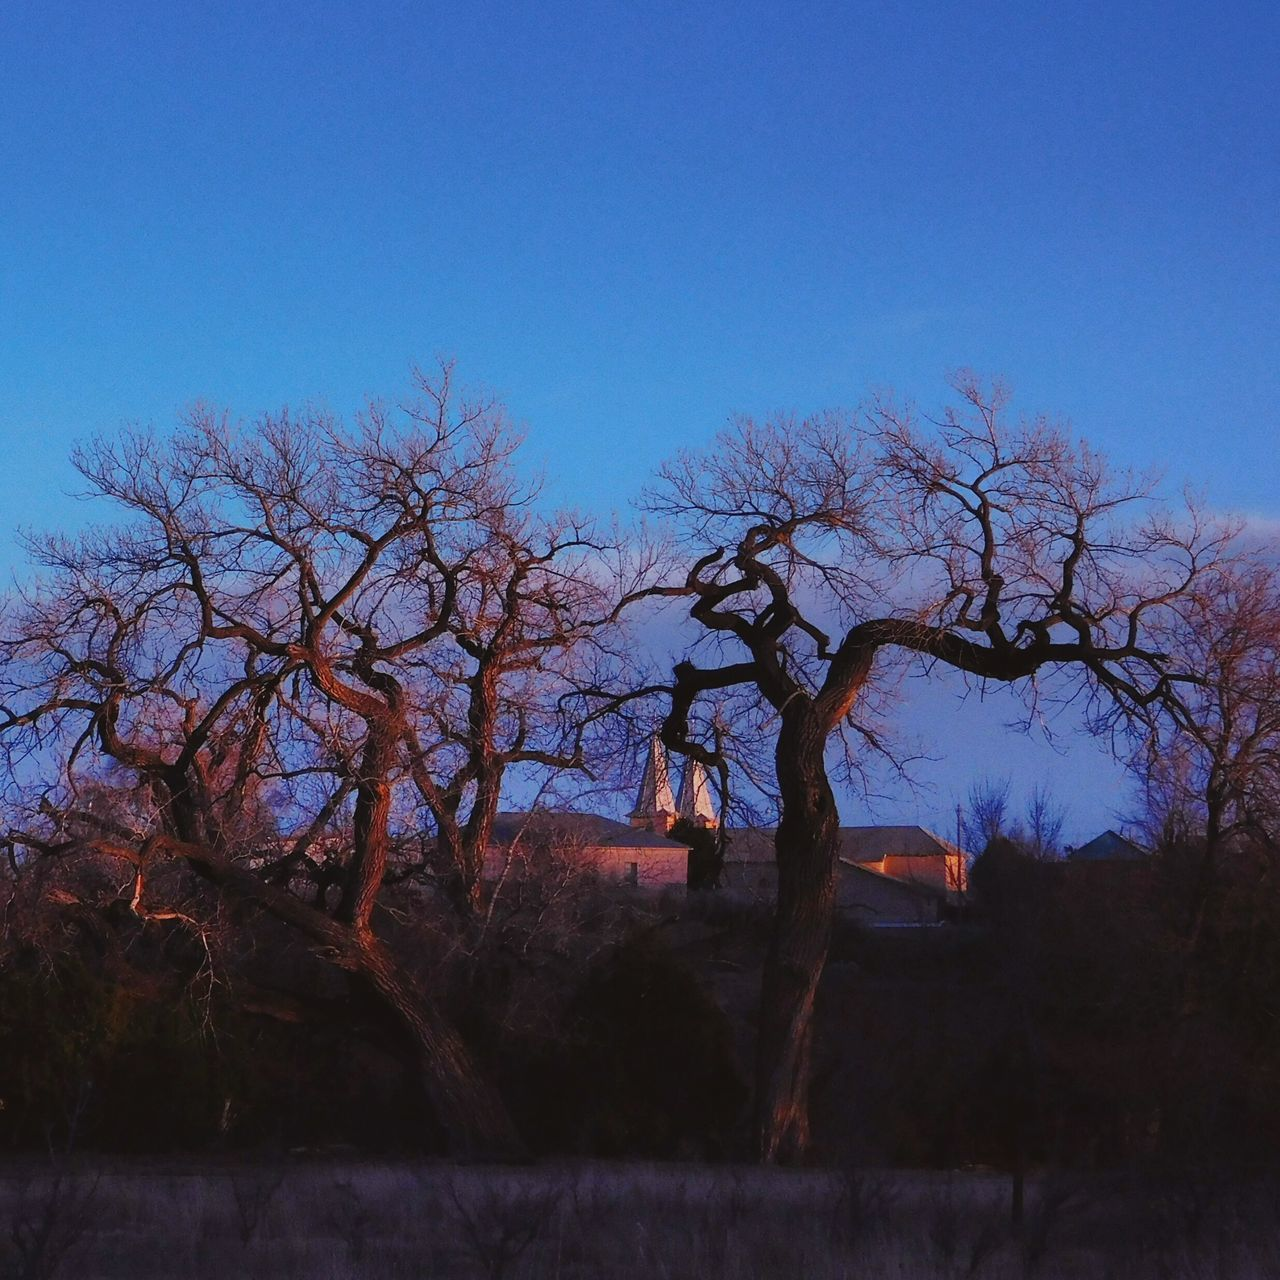 Blue Tree Sky Silhouette Rural Scene NewMexicoTRUE Newmexicoskys Newmexicophotography Newmexicoskies